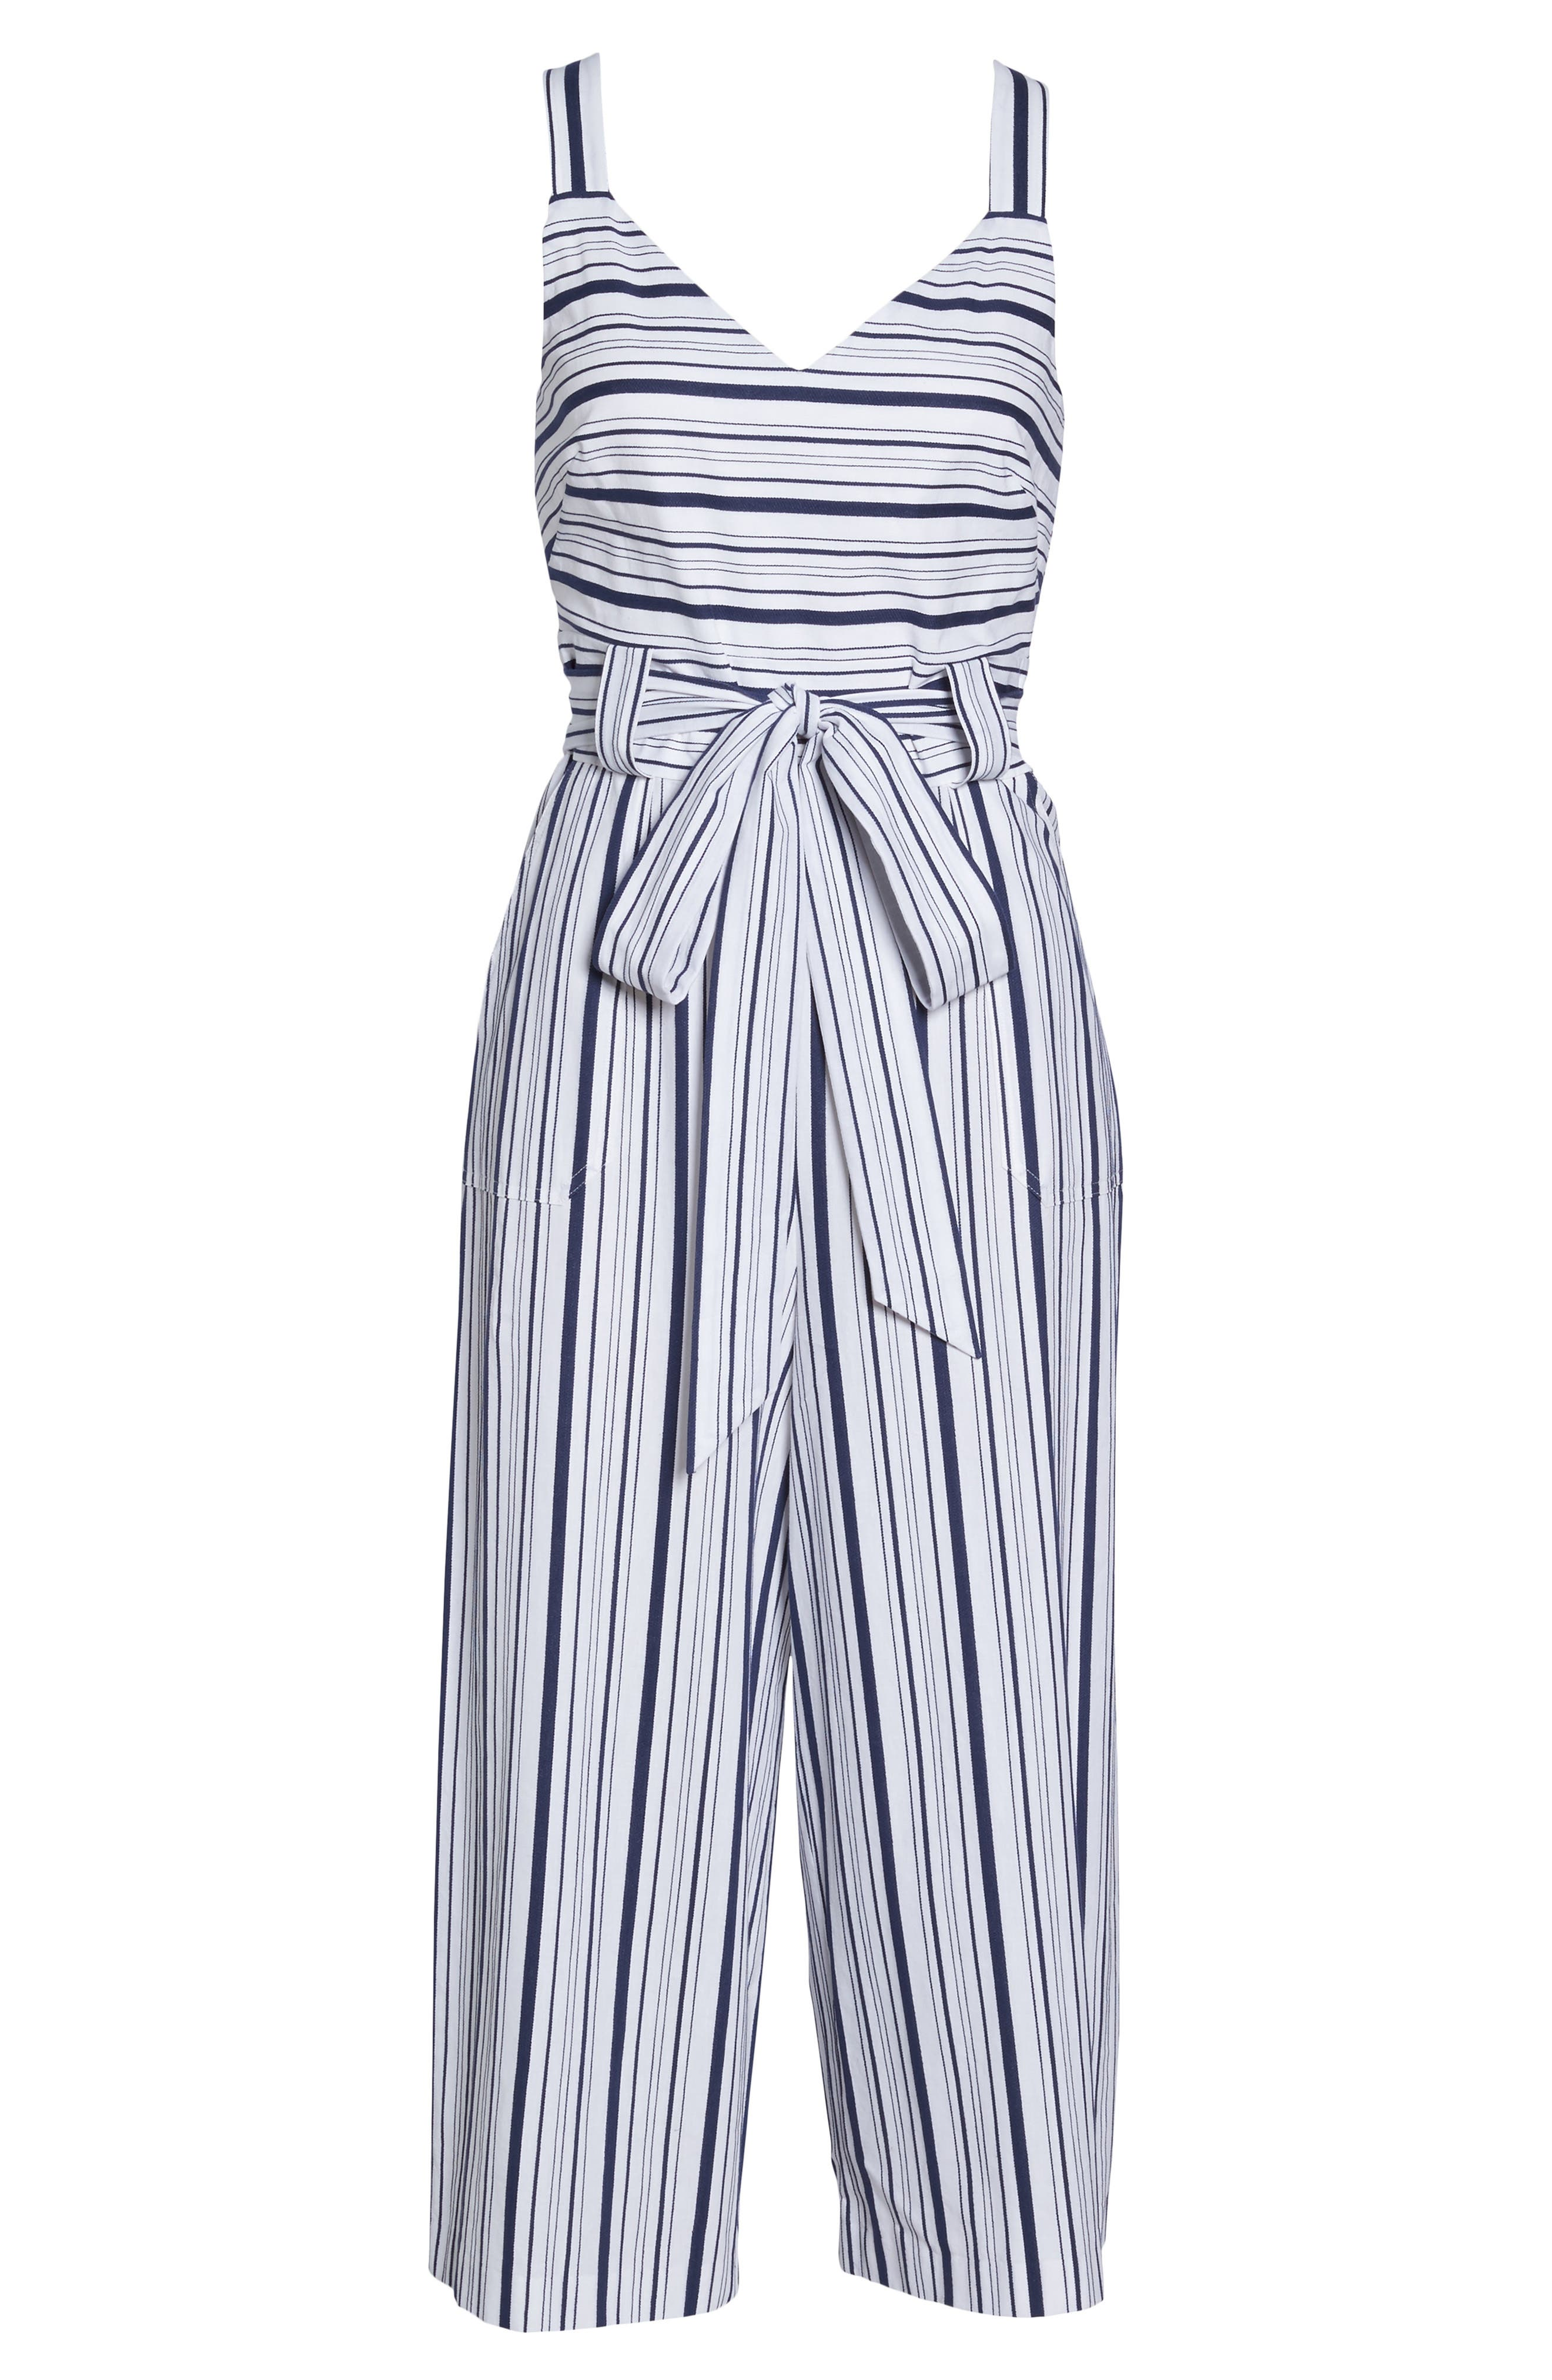 Stripe Culotte Jumpsuit,                             Alternate thumbnail 5, color,                             Blue/ White Ella Stripe